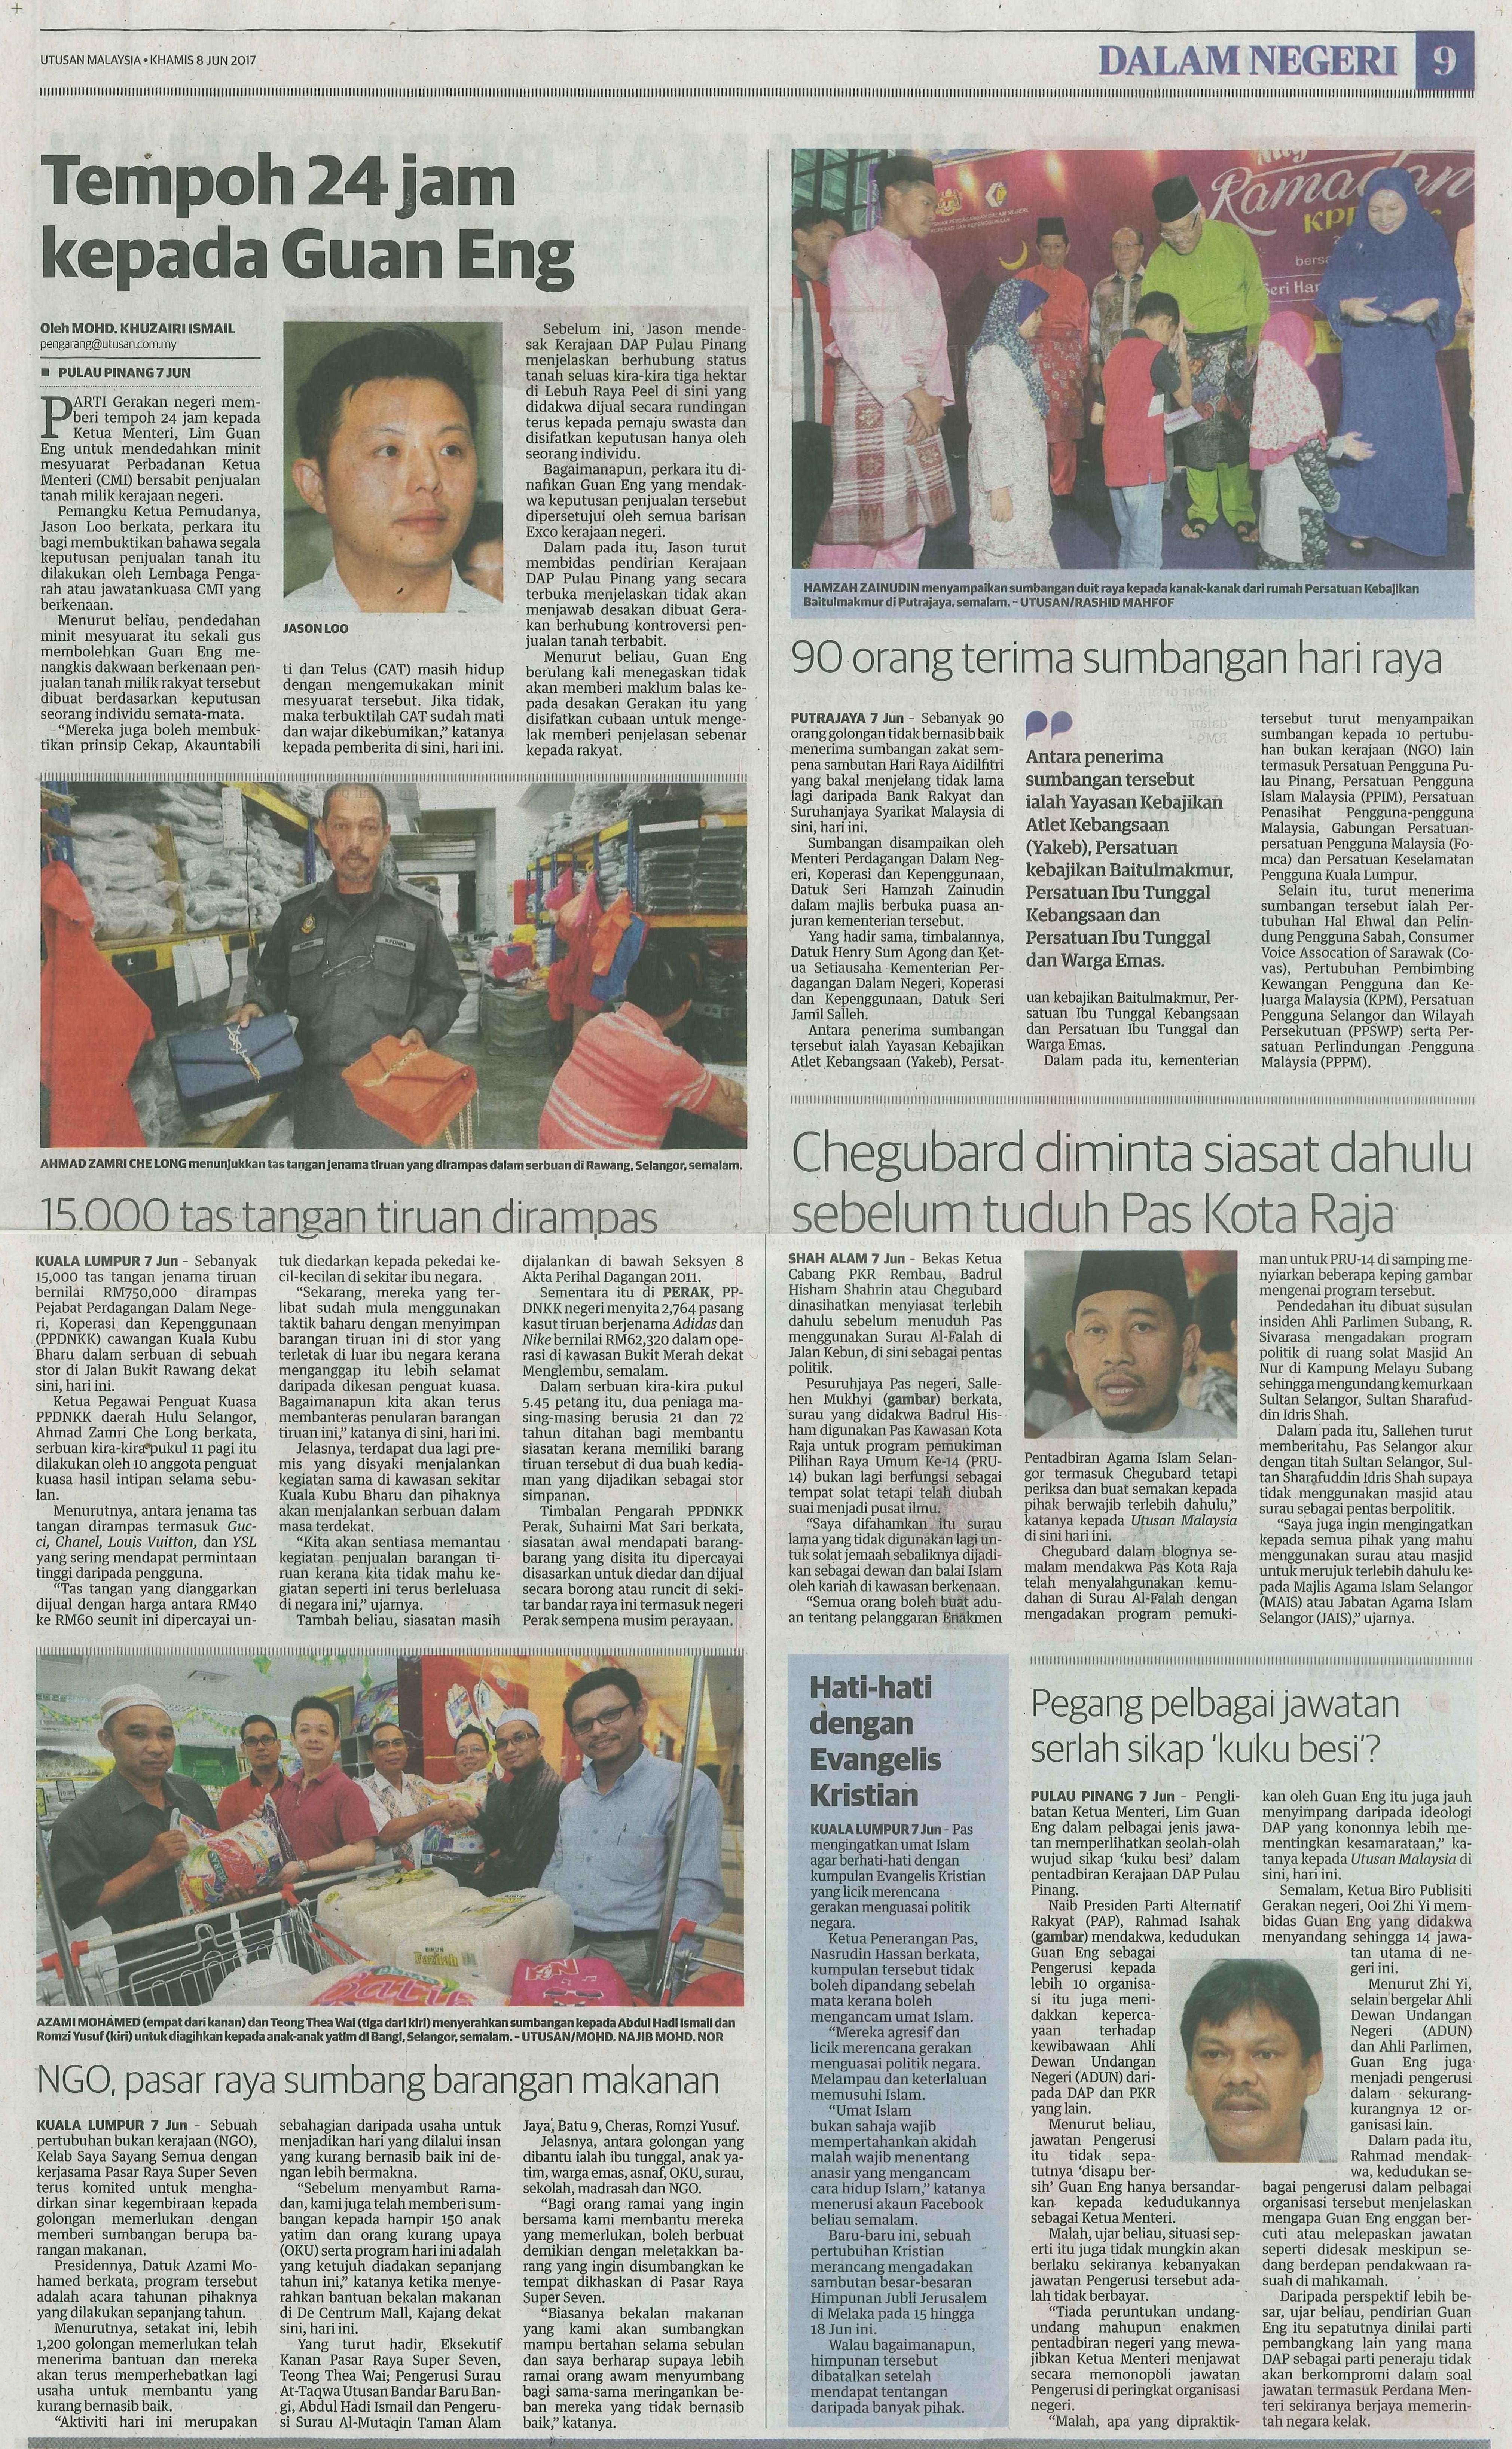 utusan malaysia 8.6.2017